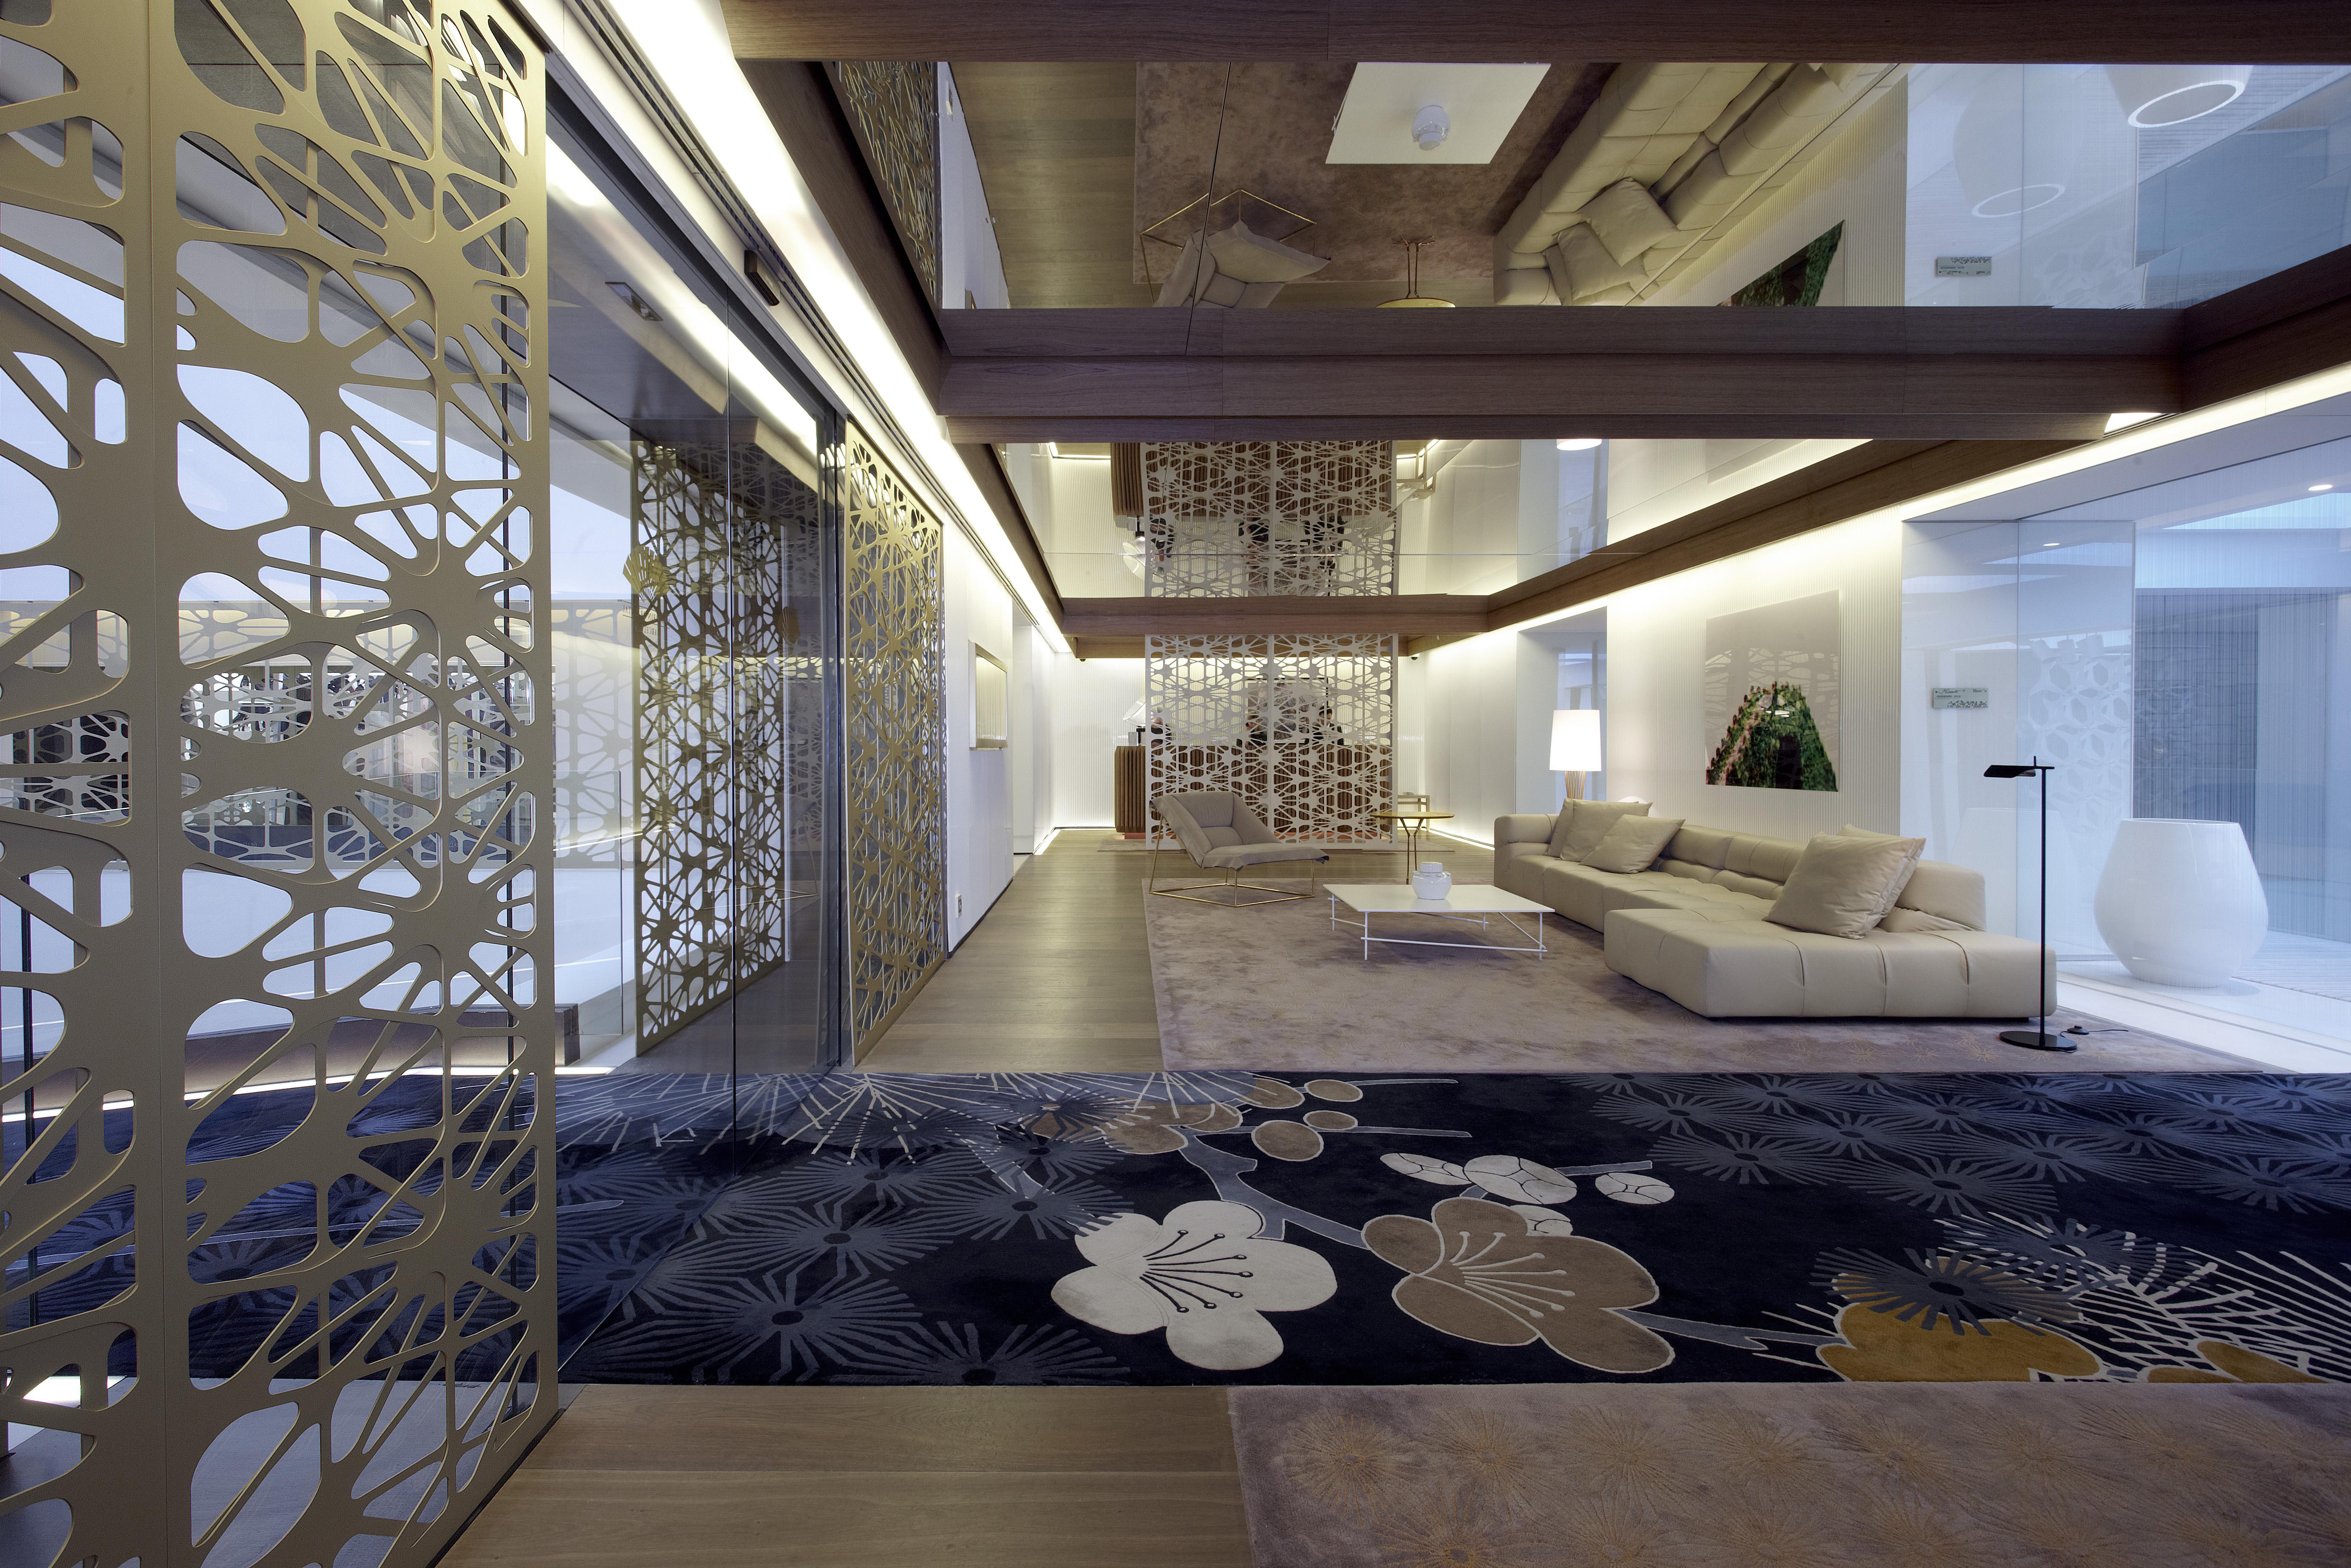 Photograph of Mandarin Oriental Hotel, Barcelona, Spain. Designed by Patricia Urquiola. Designed in 2010. (2)